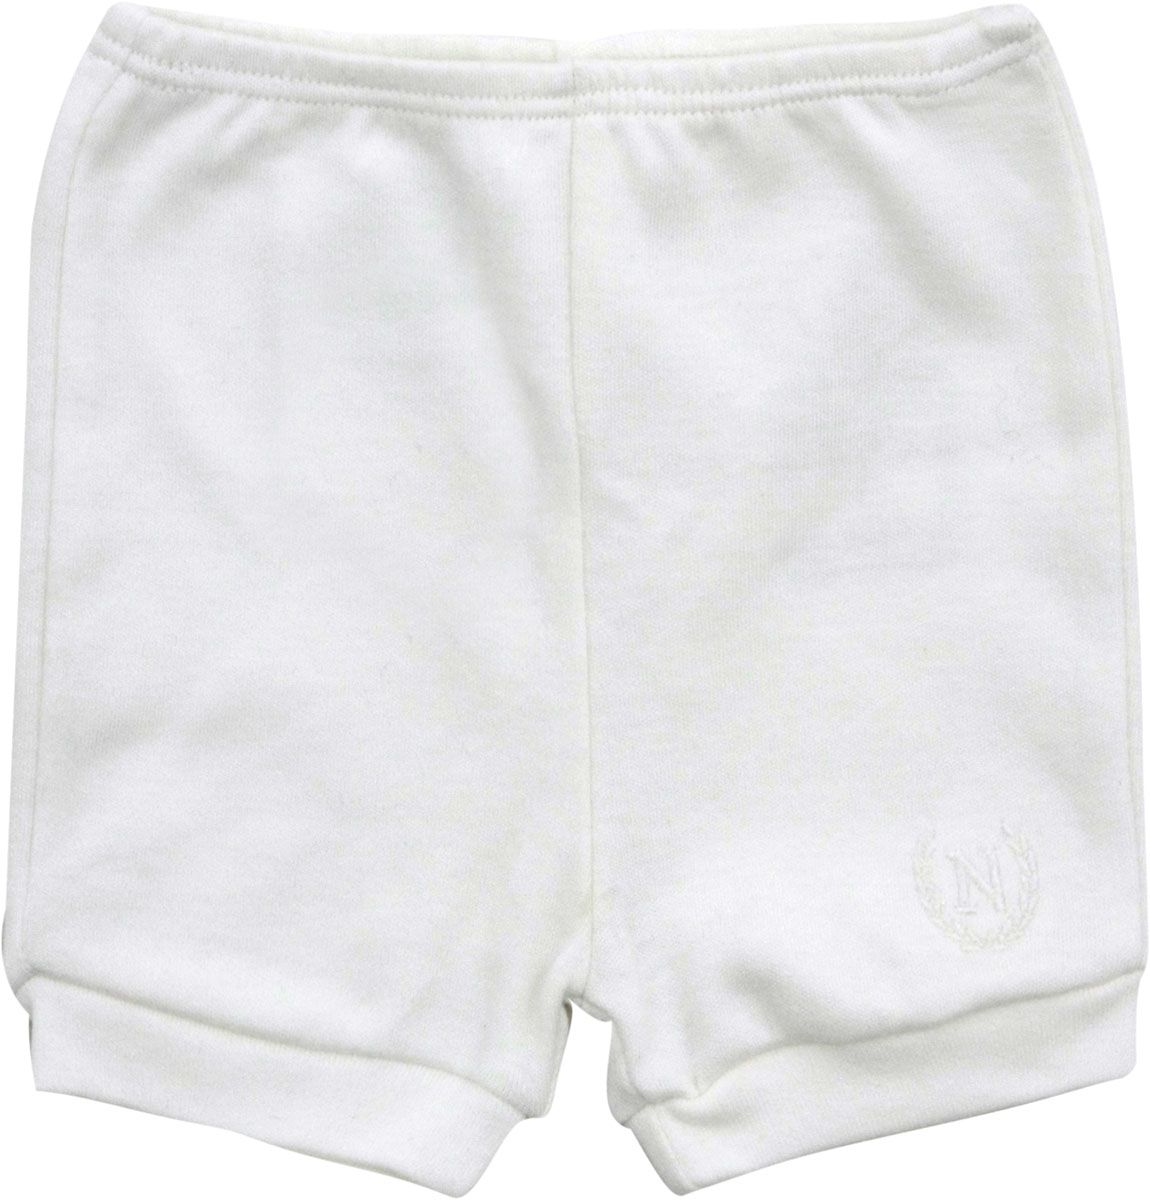 70.196 - Shorts Básico